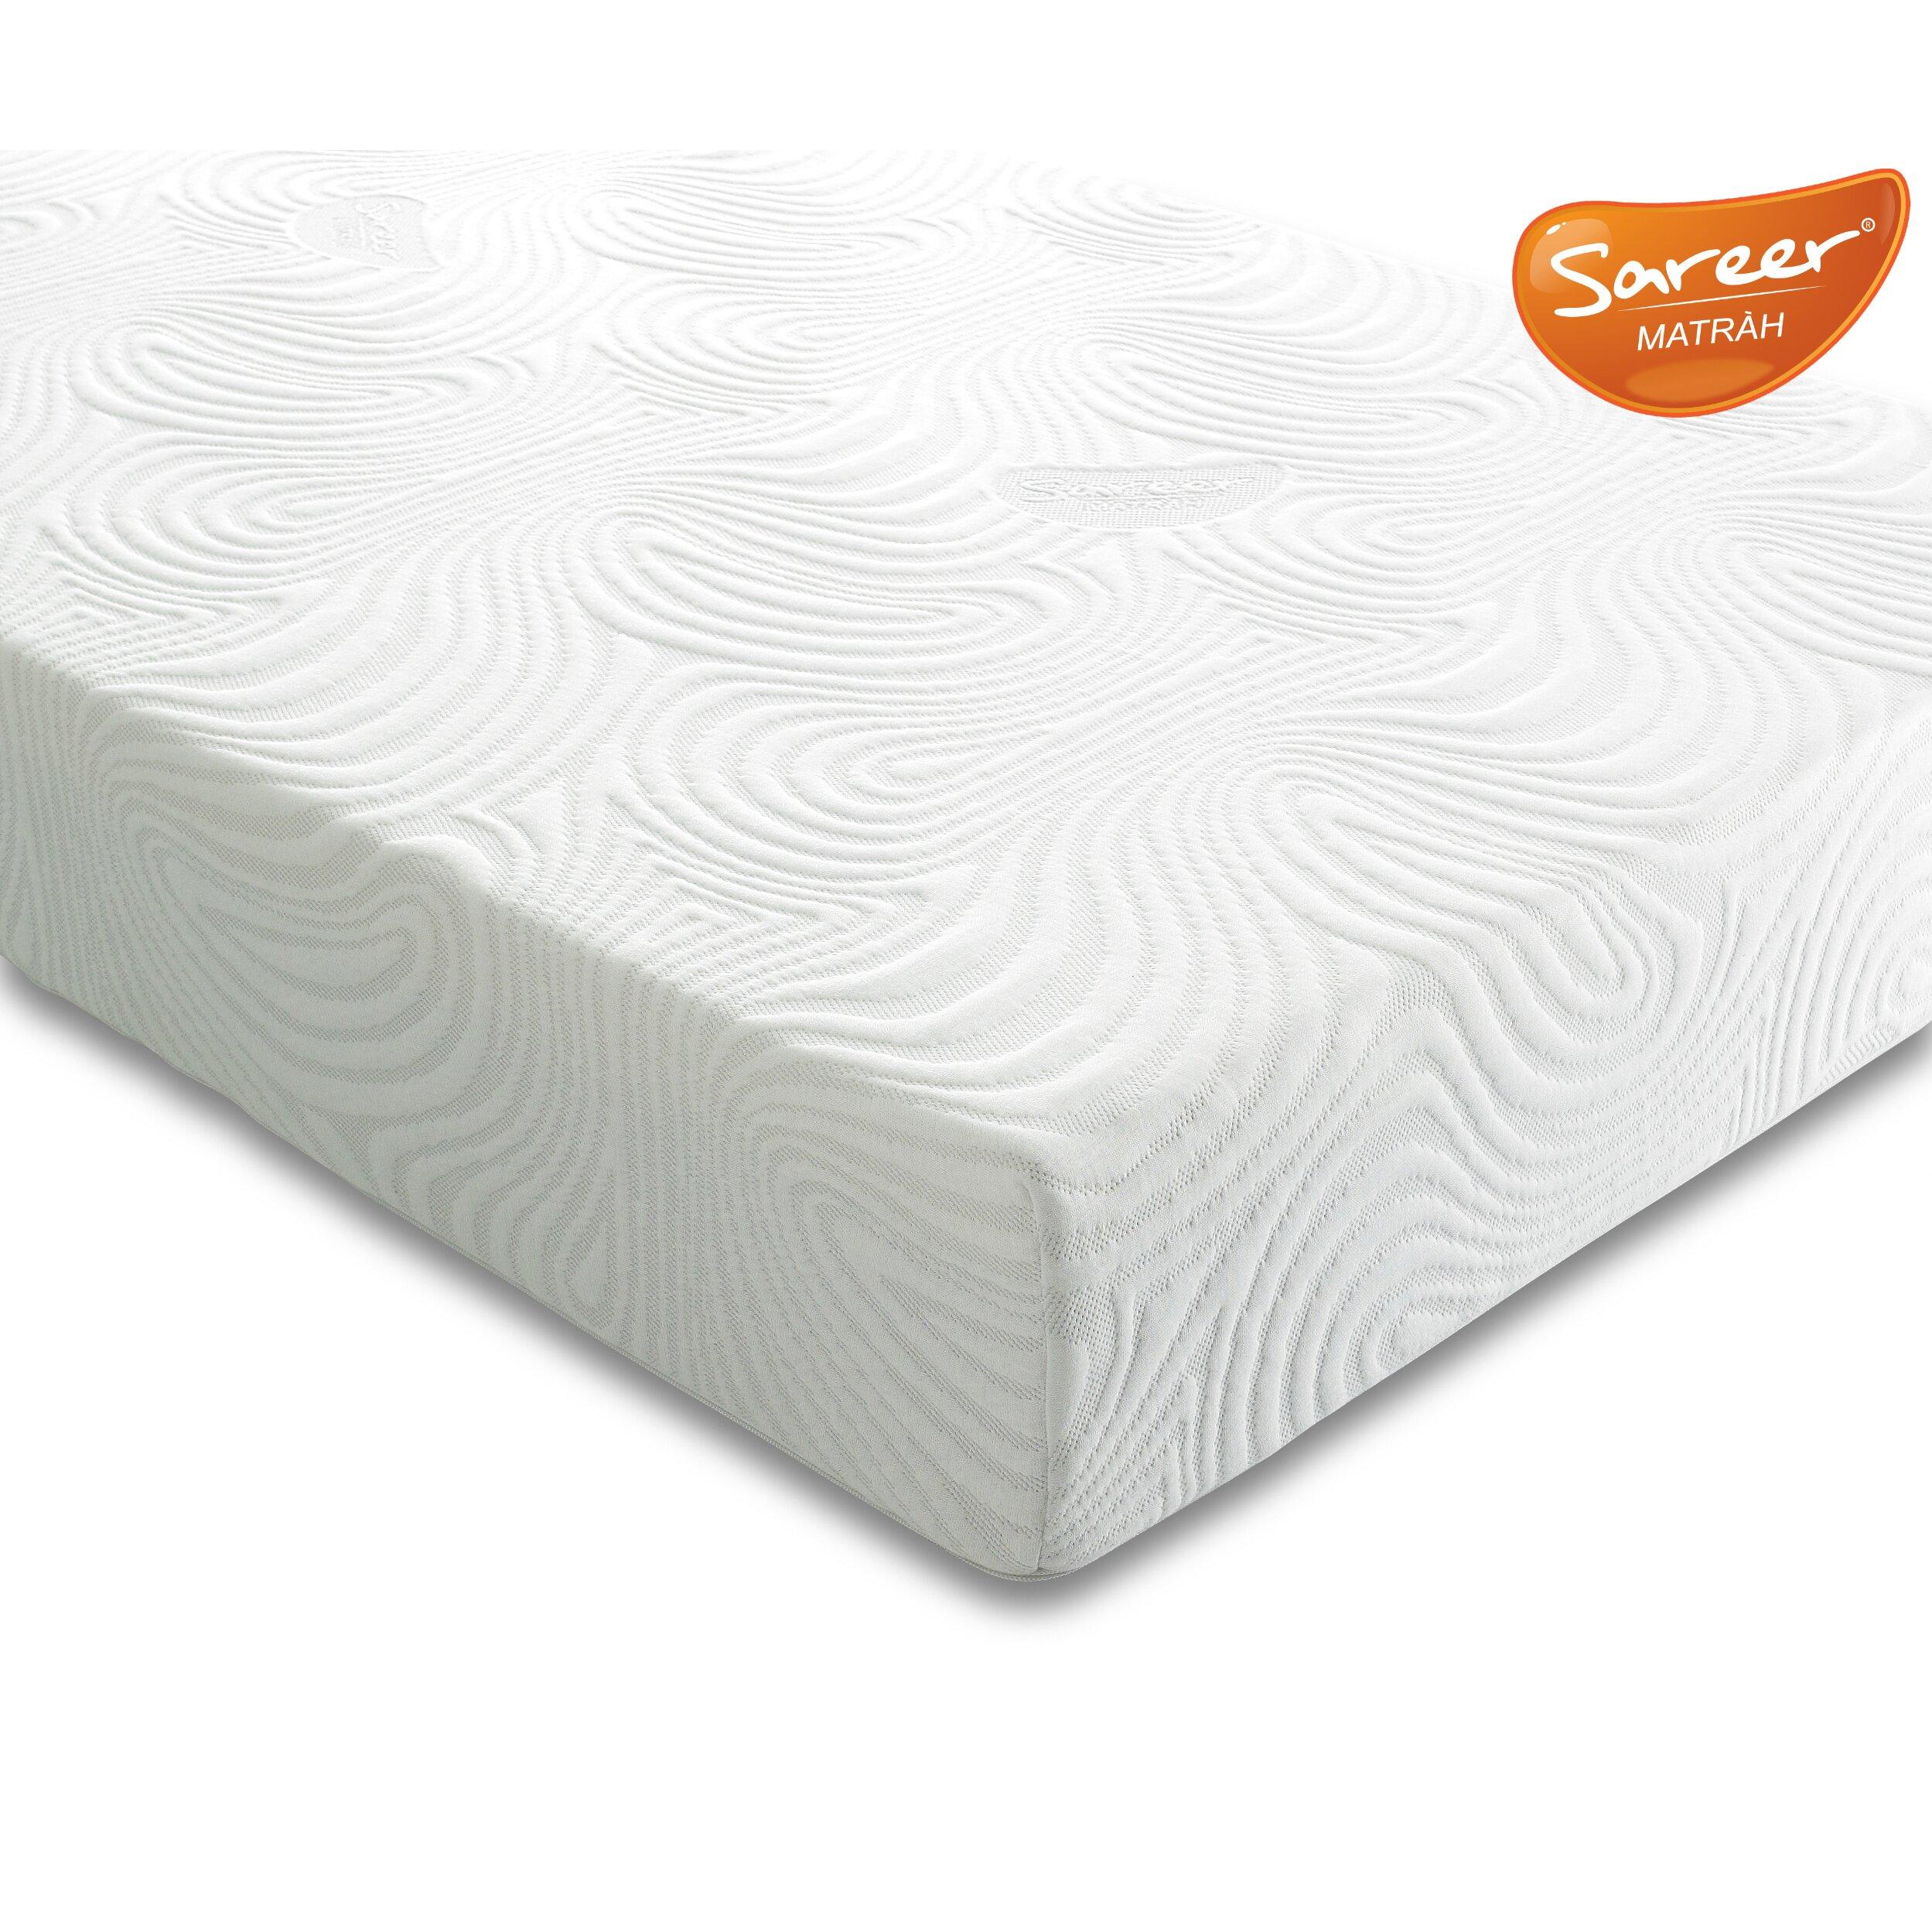 Sareer Furniture Latex Foam Mattress Reviews Wayfair Uk